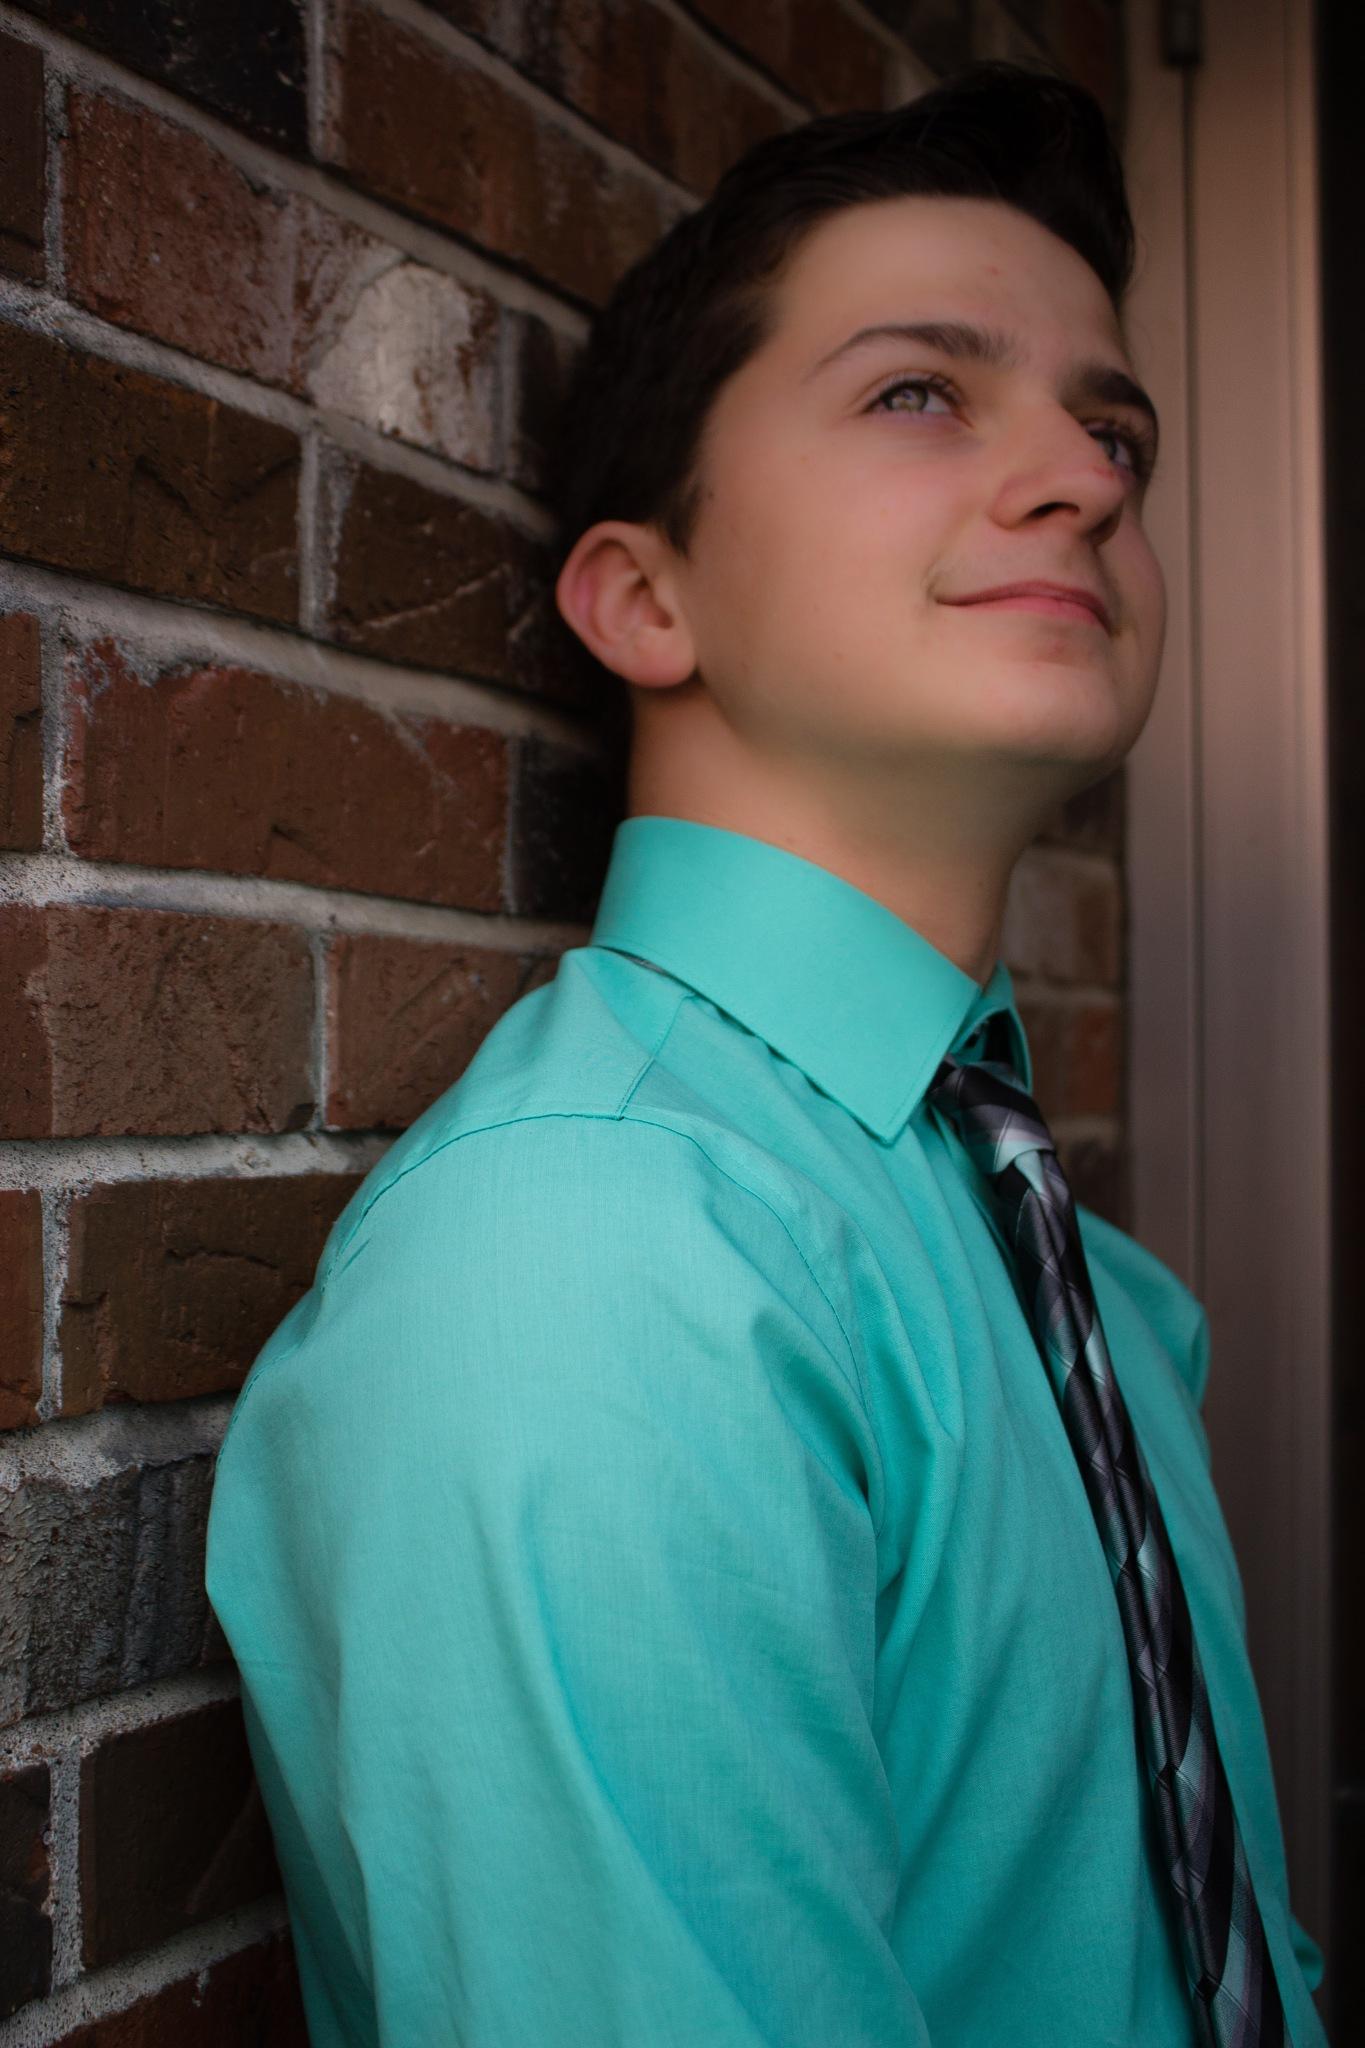 Little Brother by Jensen Jones